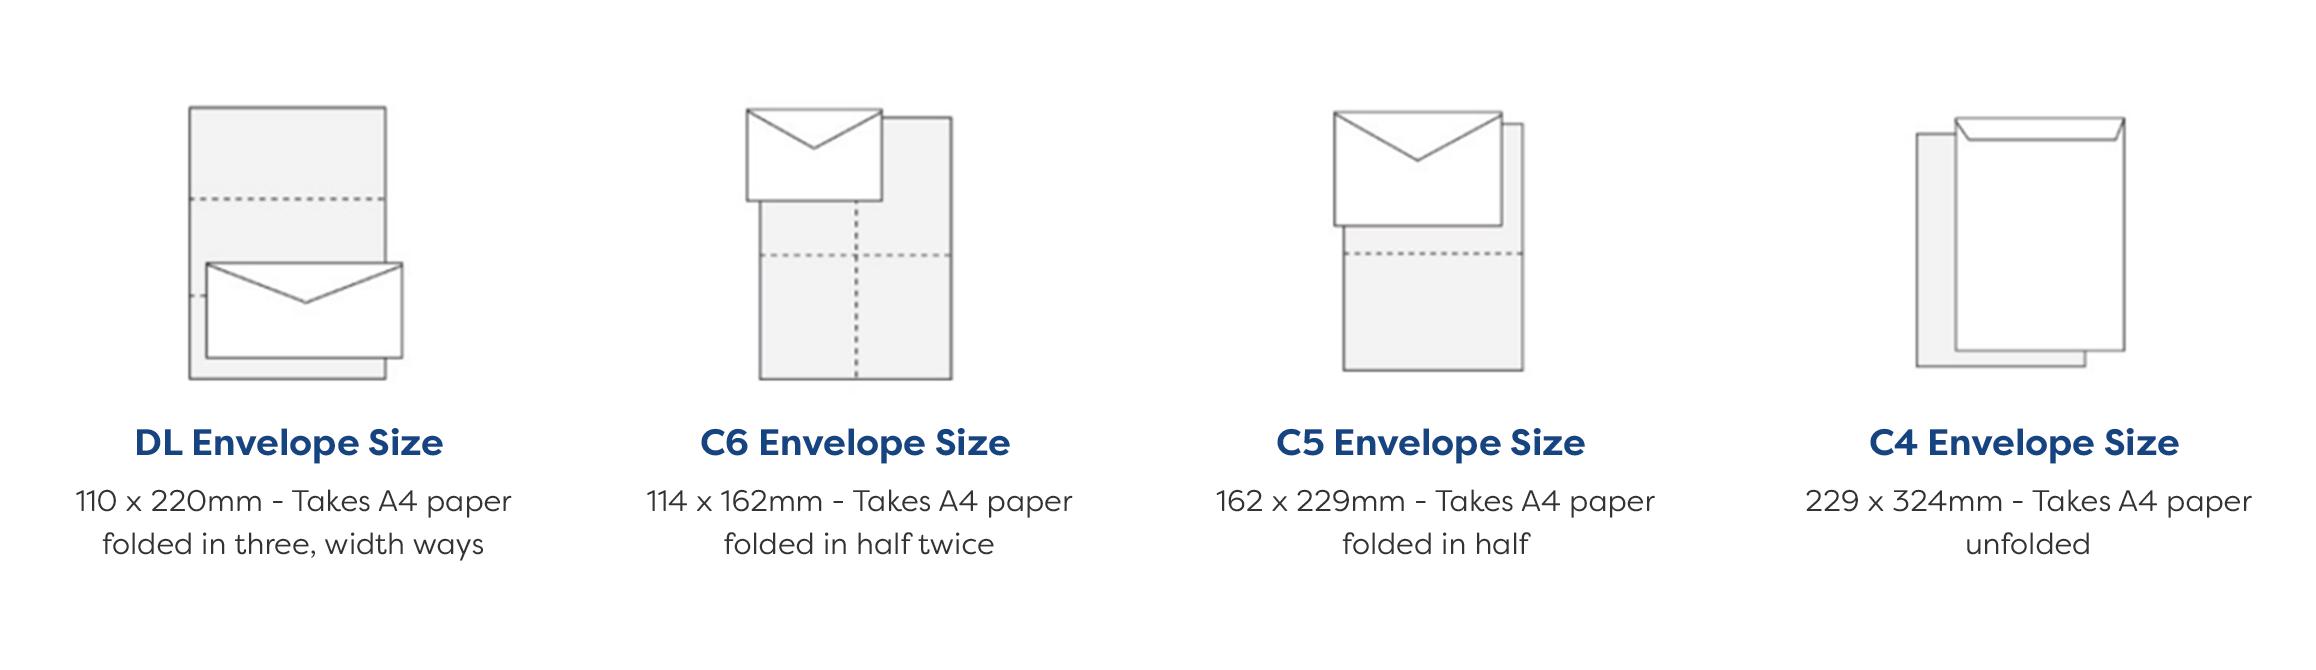 Envelopes Ireland sizes